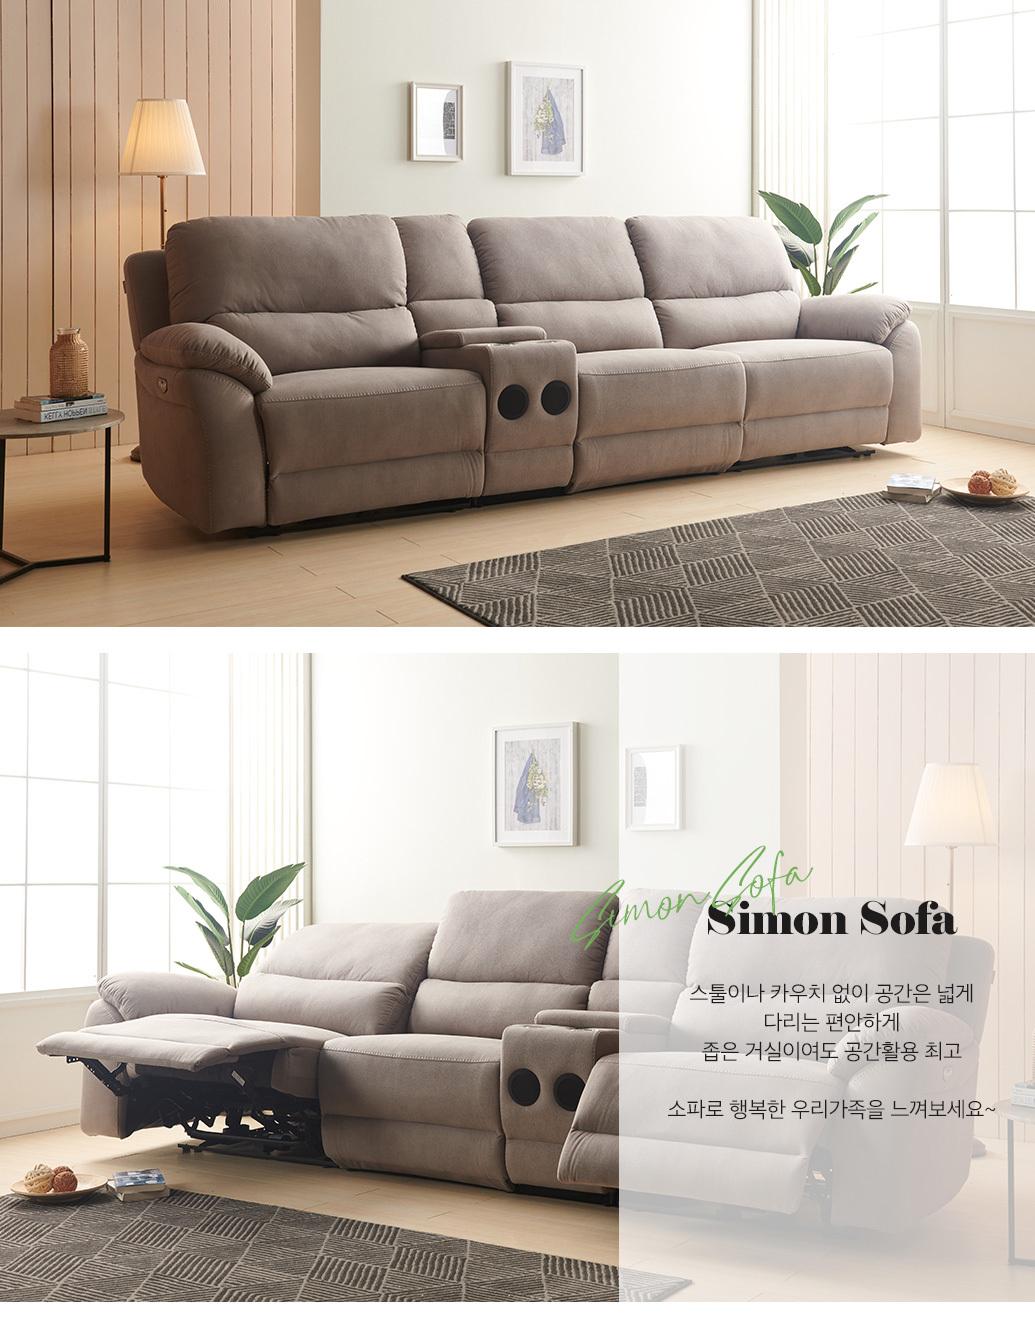 simon_sofa_05.jpg